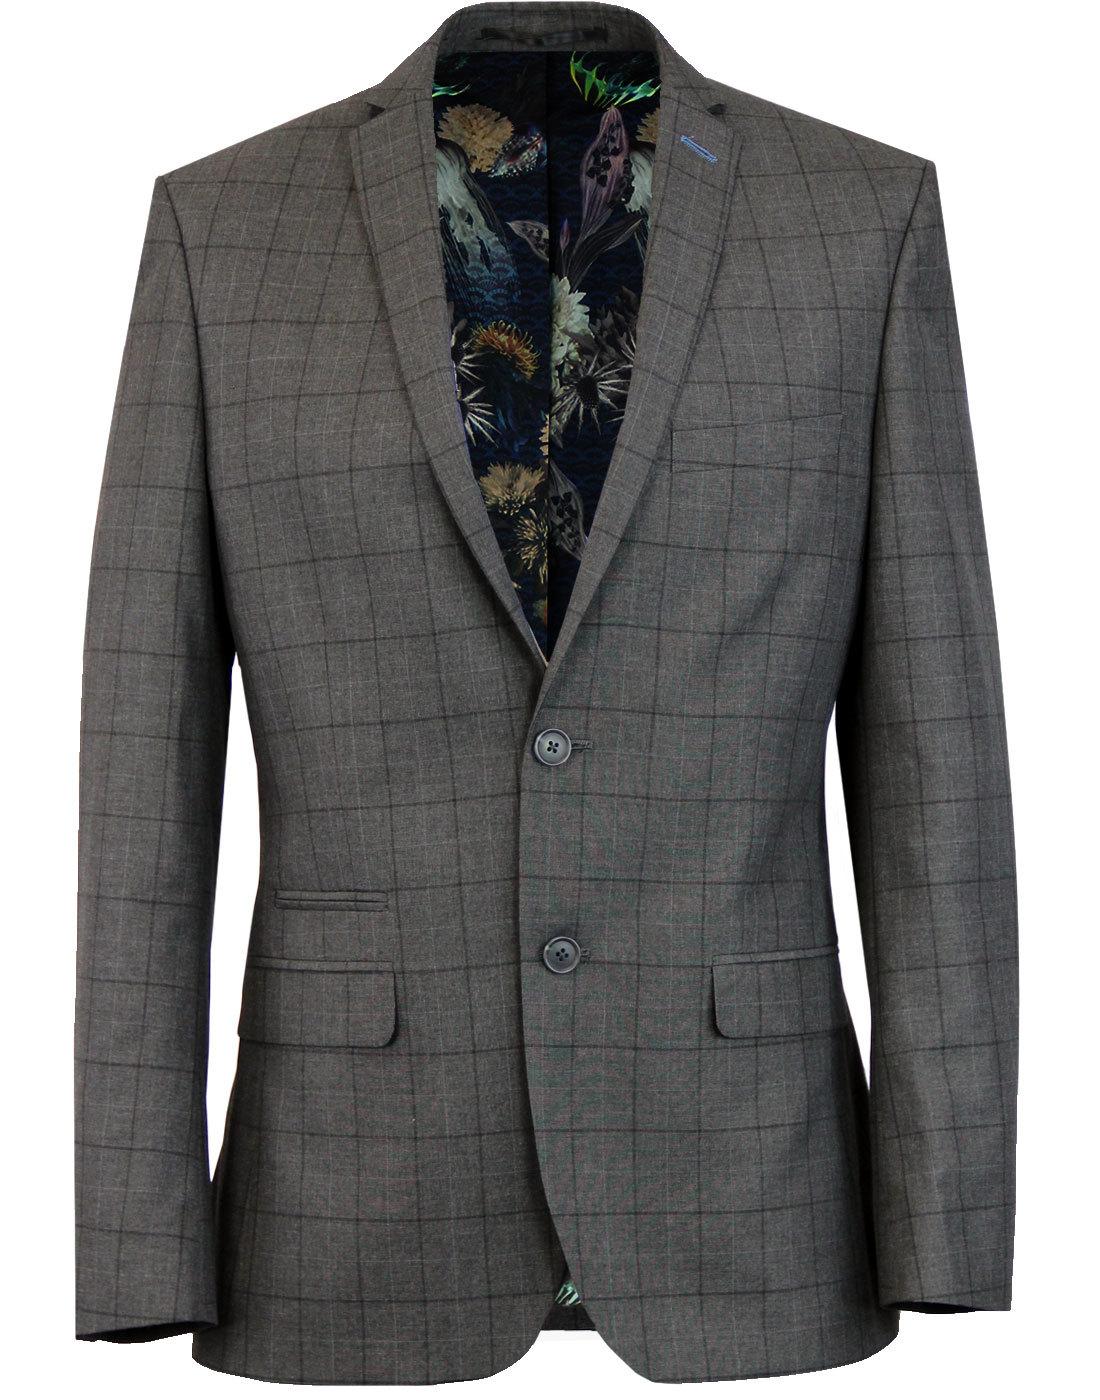 Retro Mod Windowpane Check 2 Button Suit Jacket